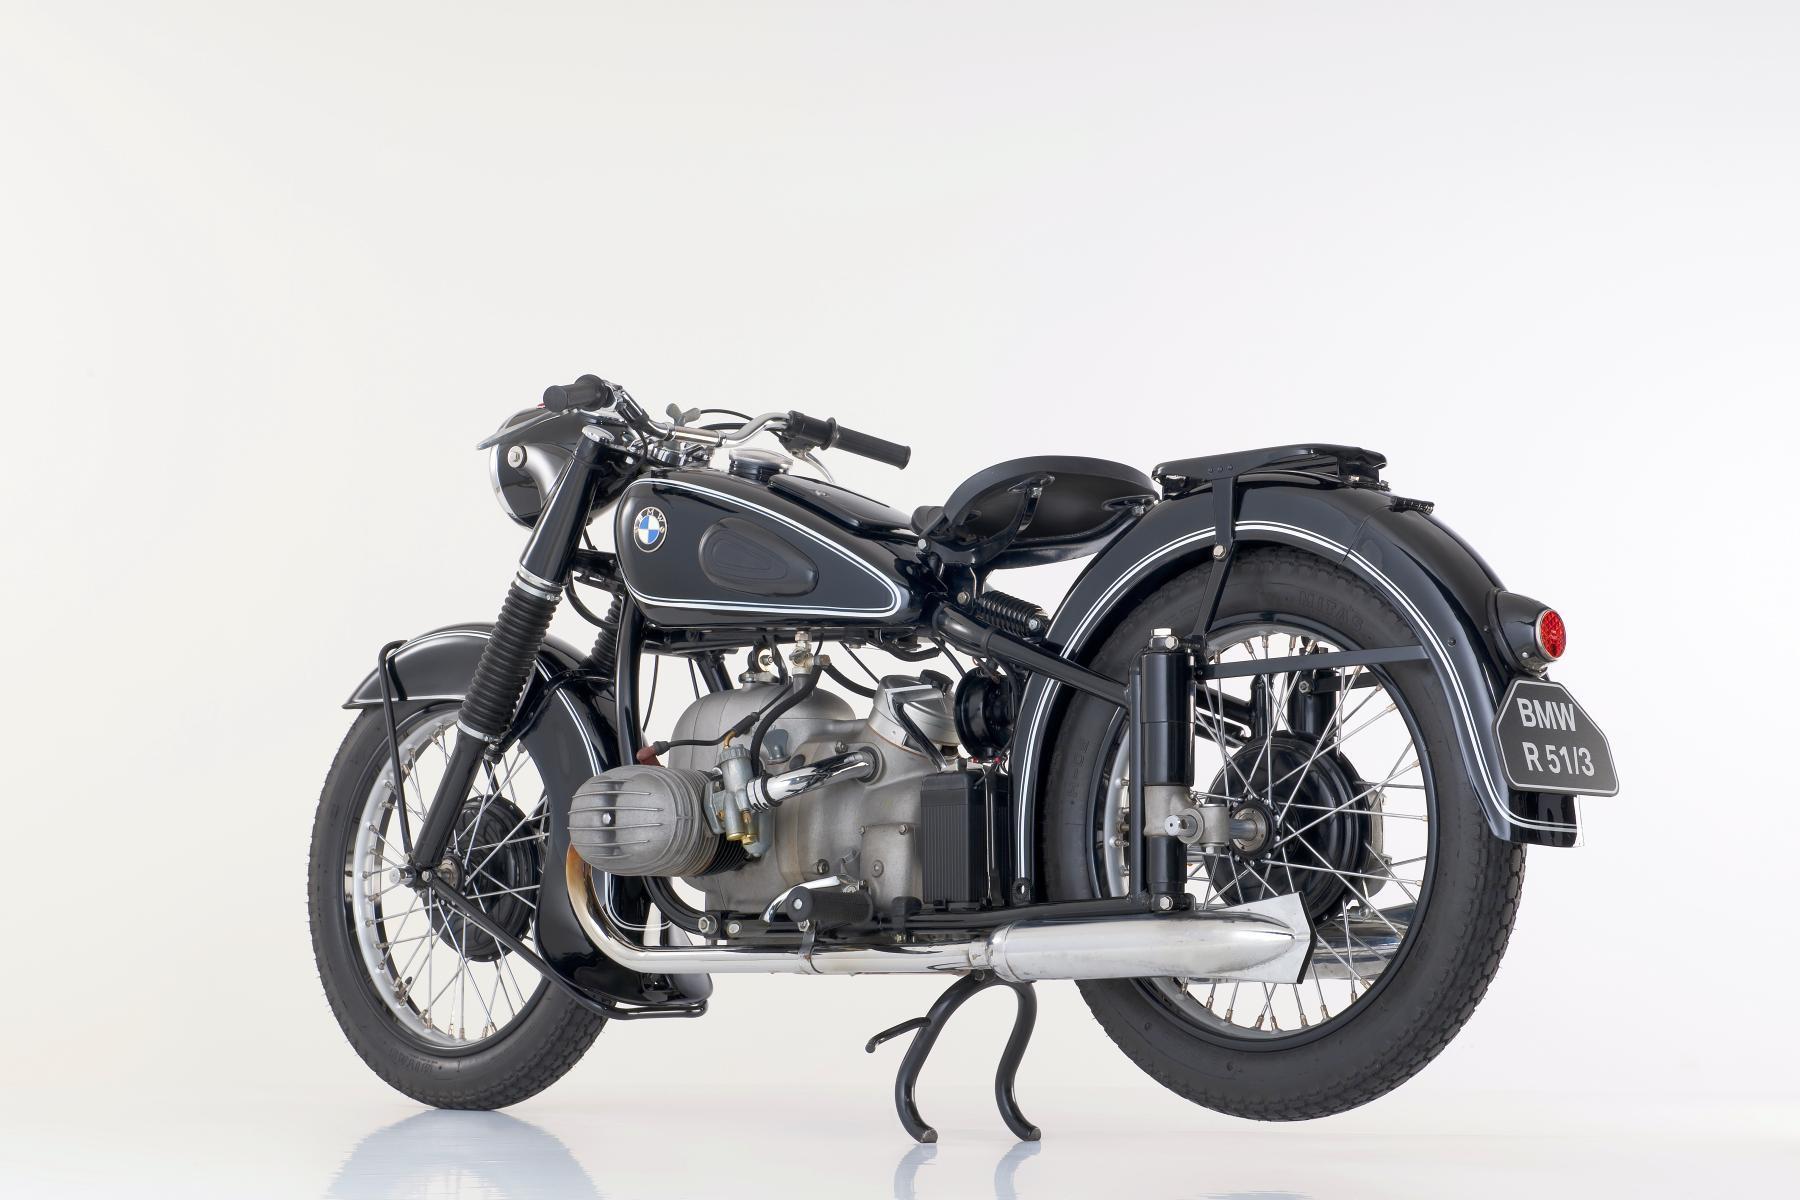 oldtimergalerie bmw r 51 3 motorrad fotos motorrad bilder. Black Bedroom Furniture Sets. Home Design Ideas